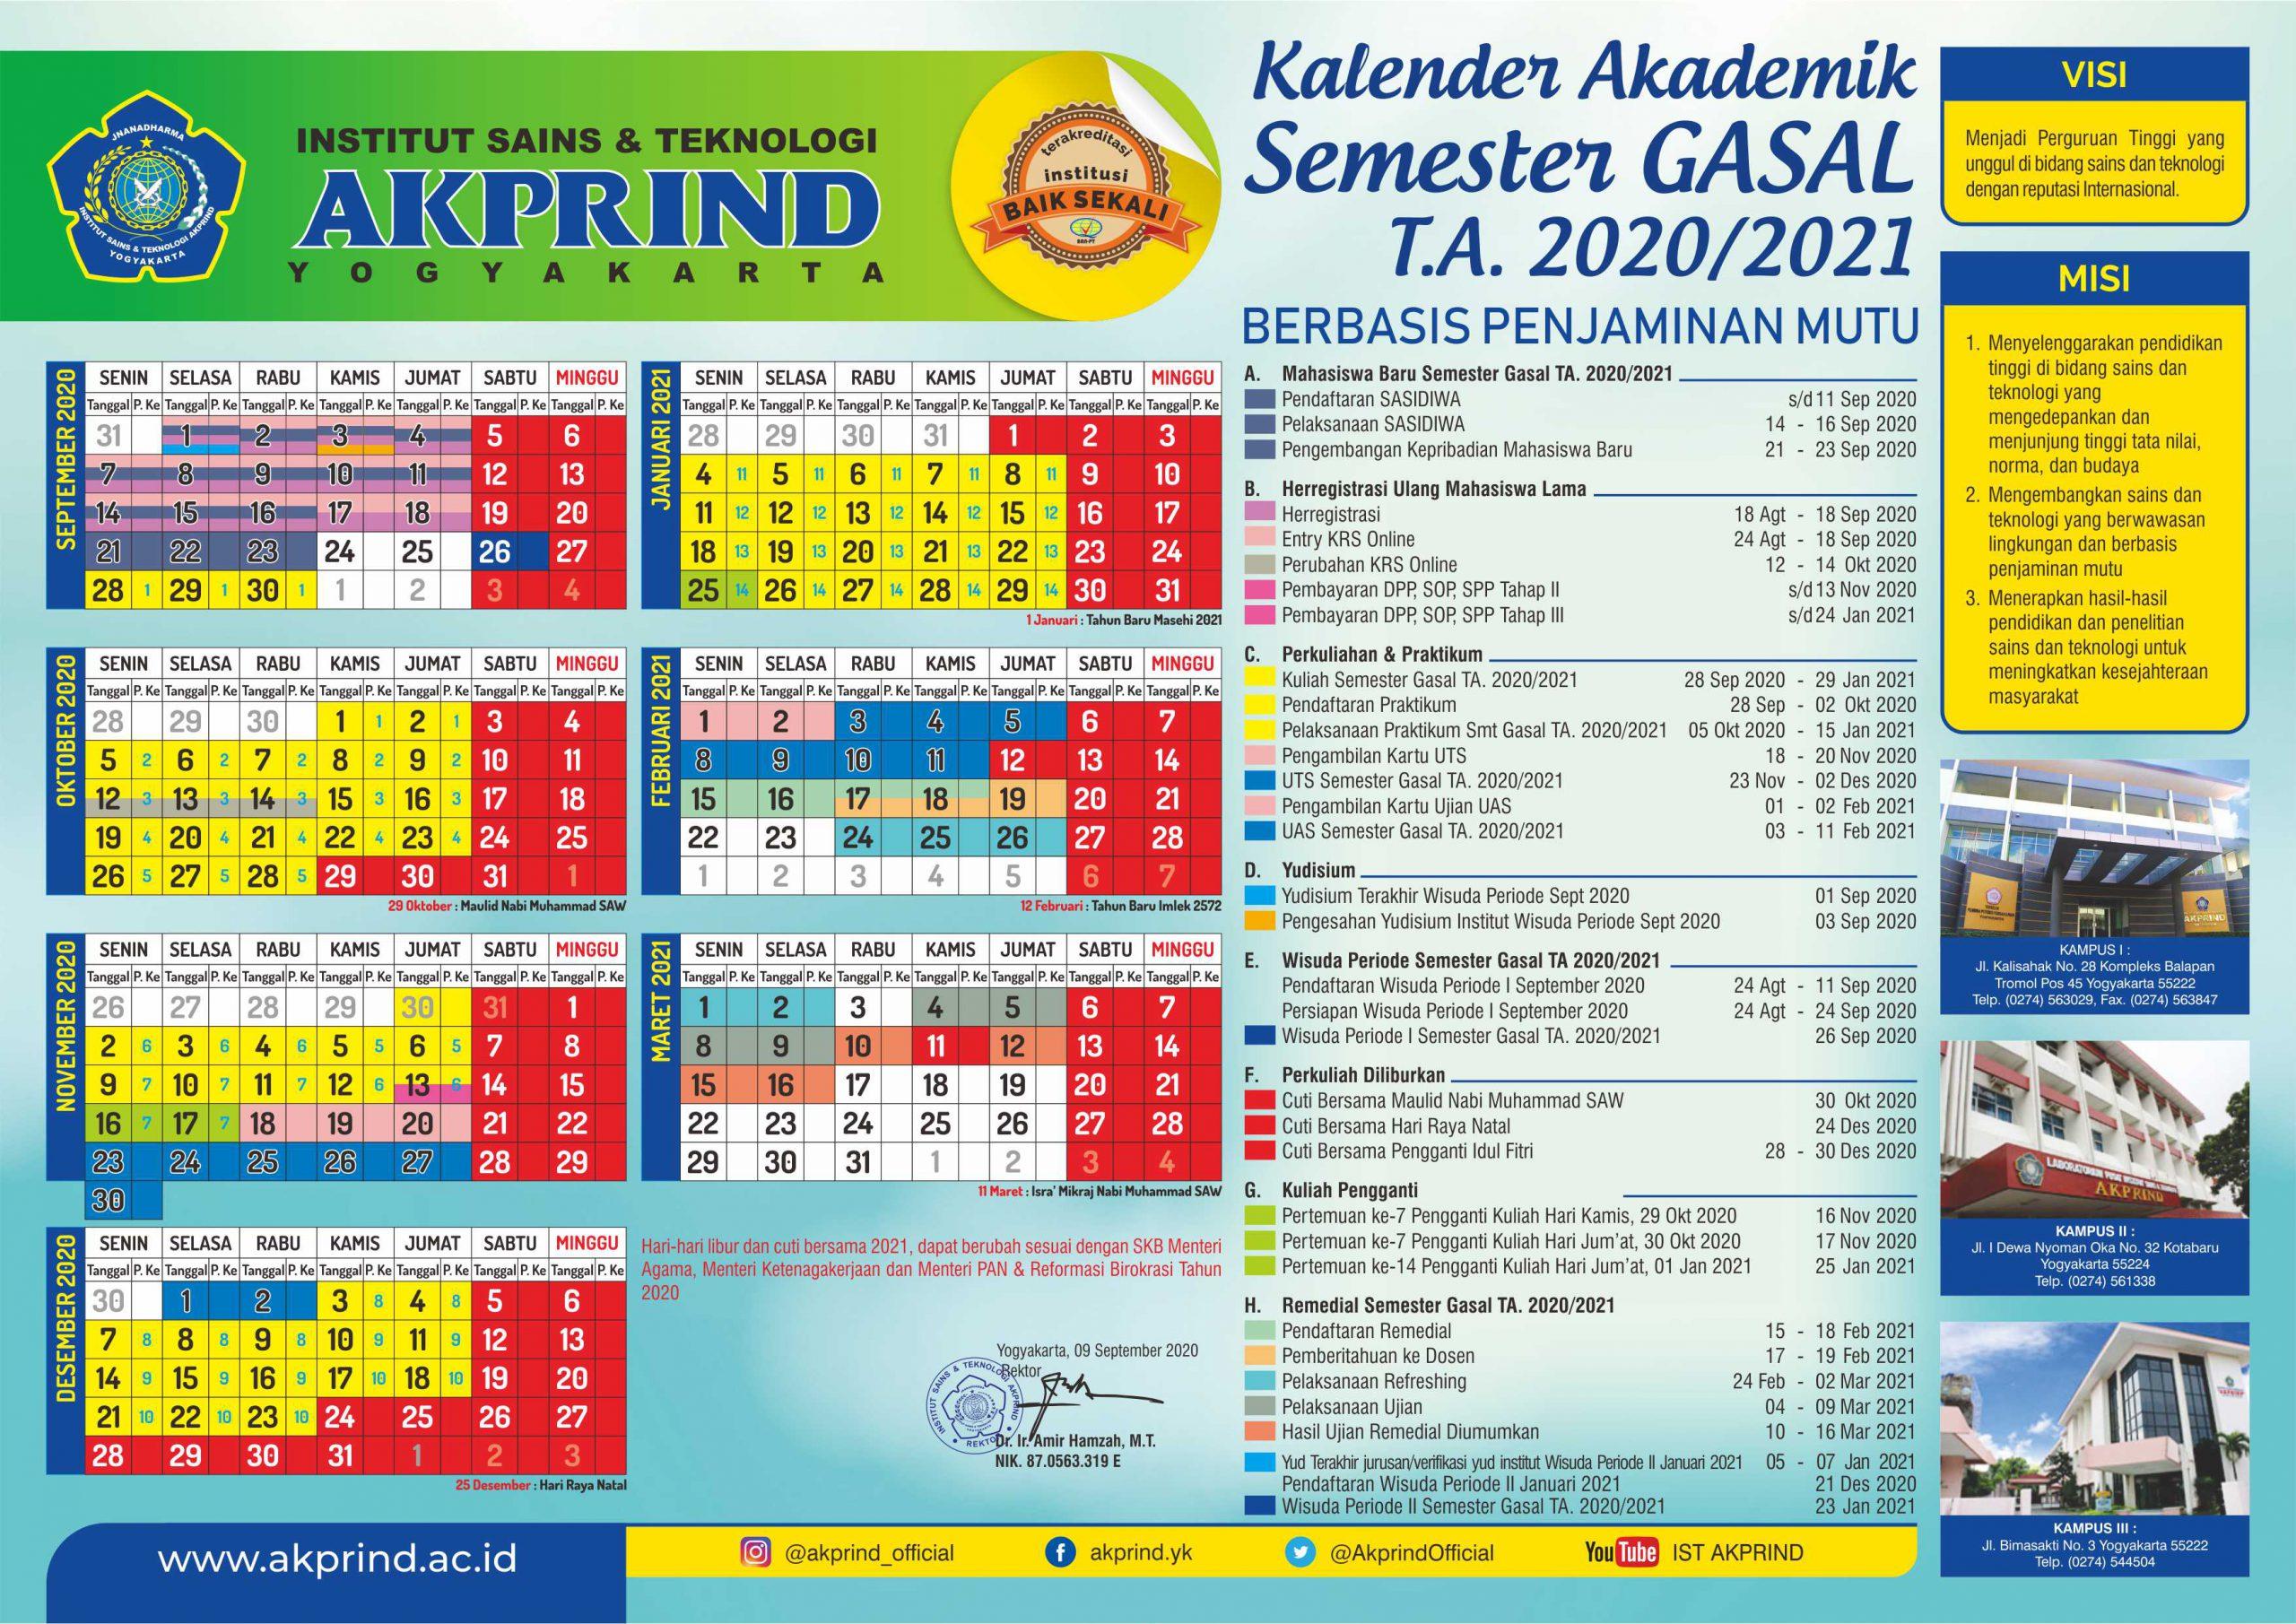 Kalender Semester Gasal 2020/2021